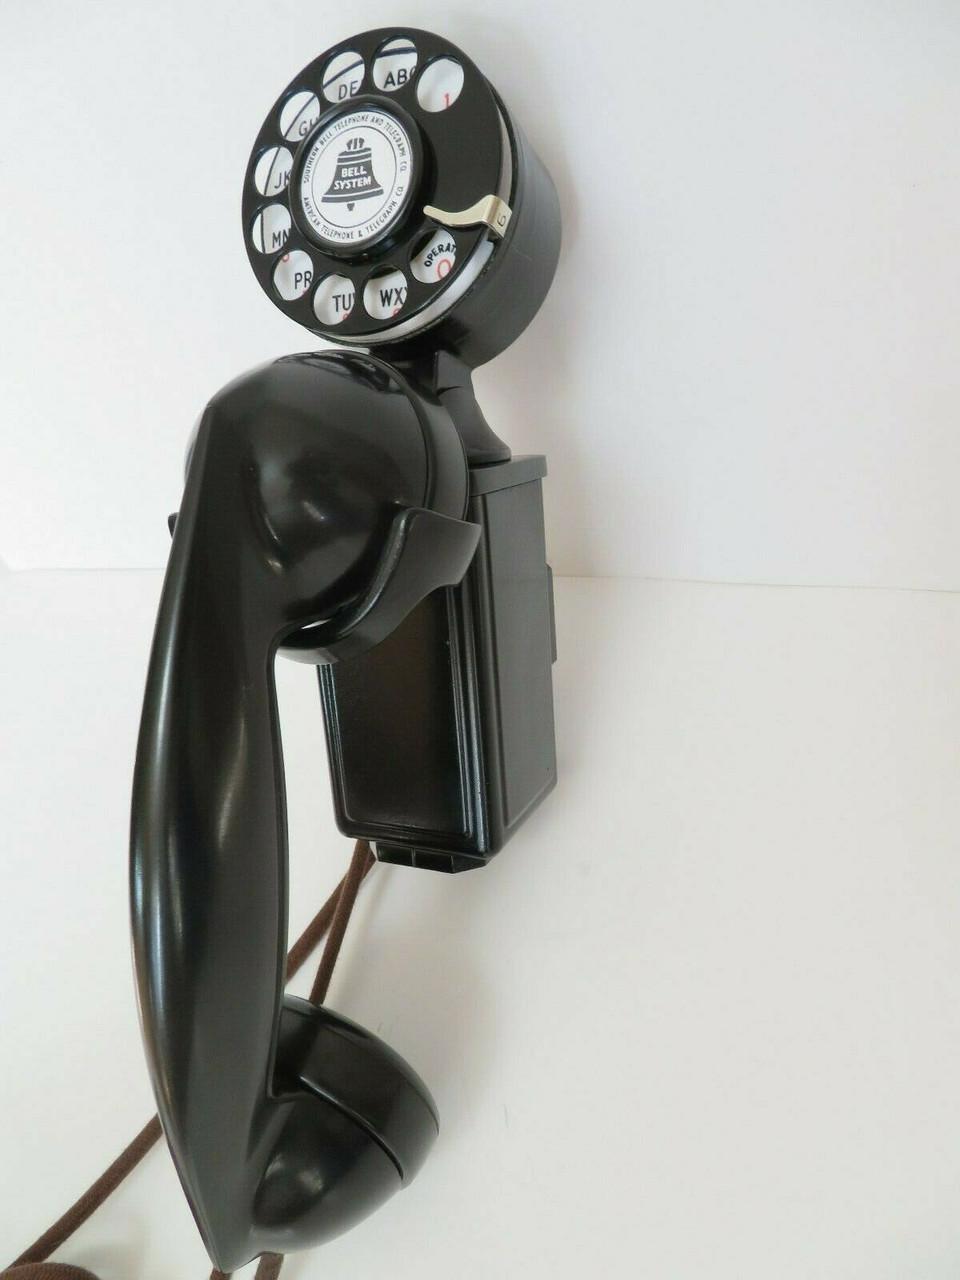 Western Electric F1 handset